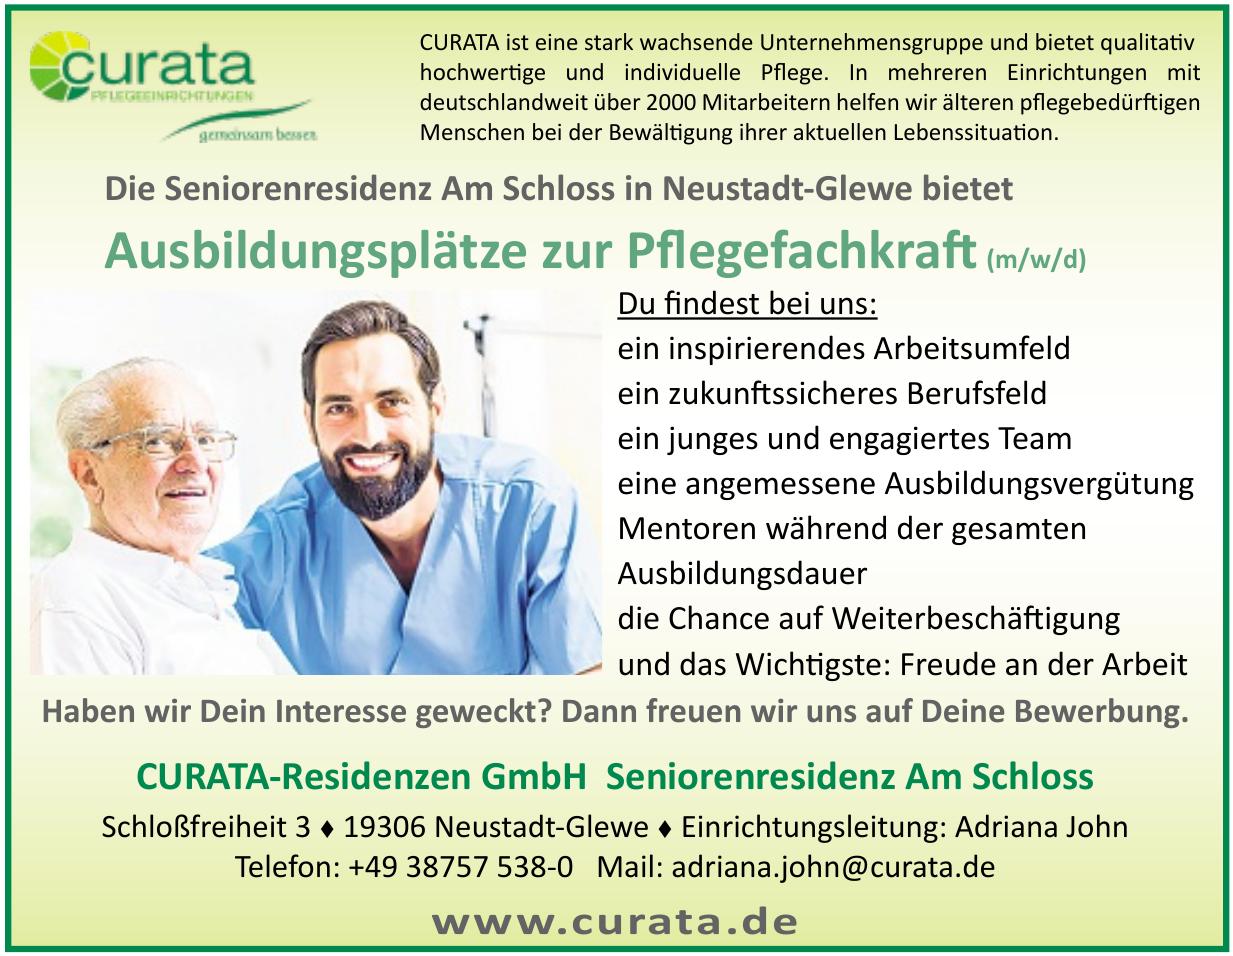 CURATA-Residenzen GmbH - Seniorenresidenz Am Schloss